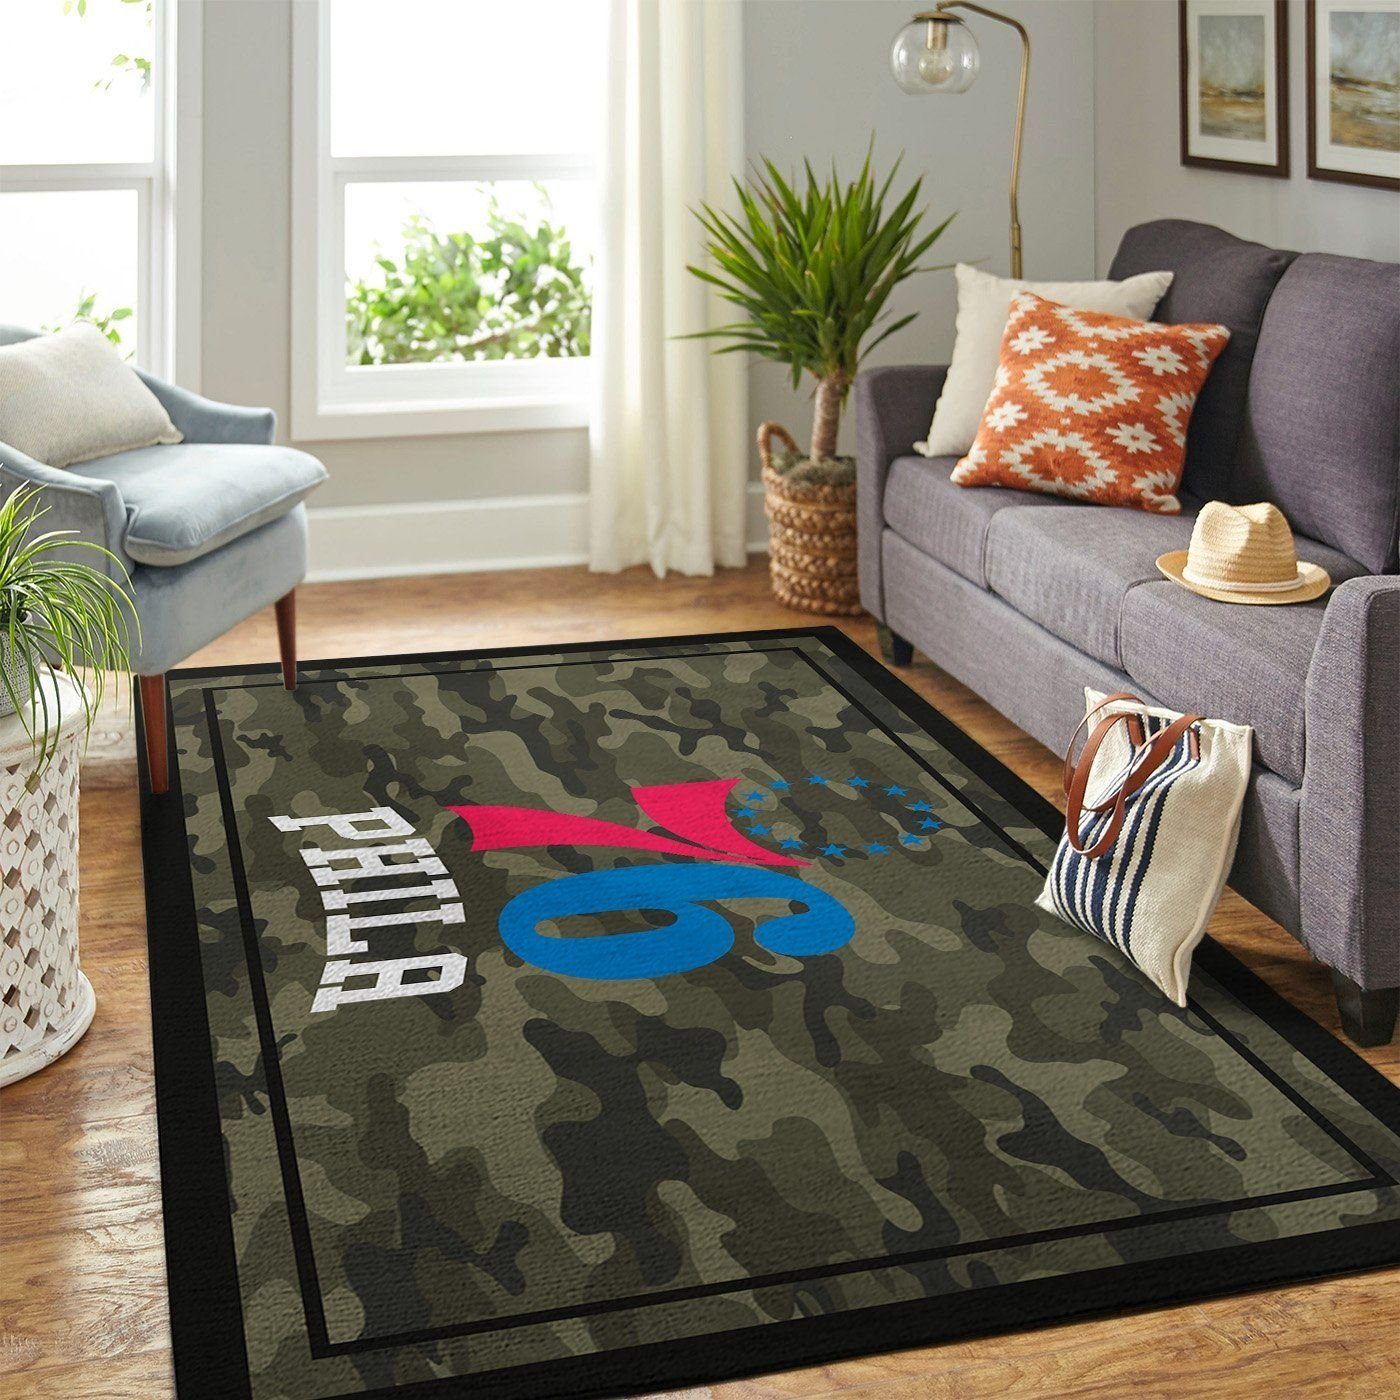 Amazon Philadelphia 76ers Living Room Area No4451 Rug